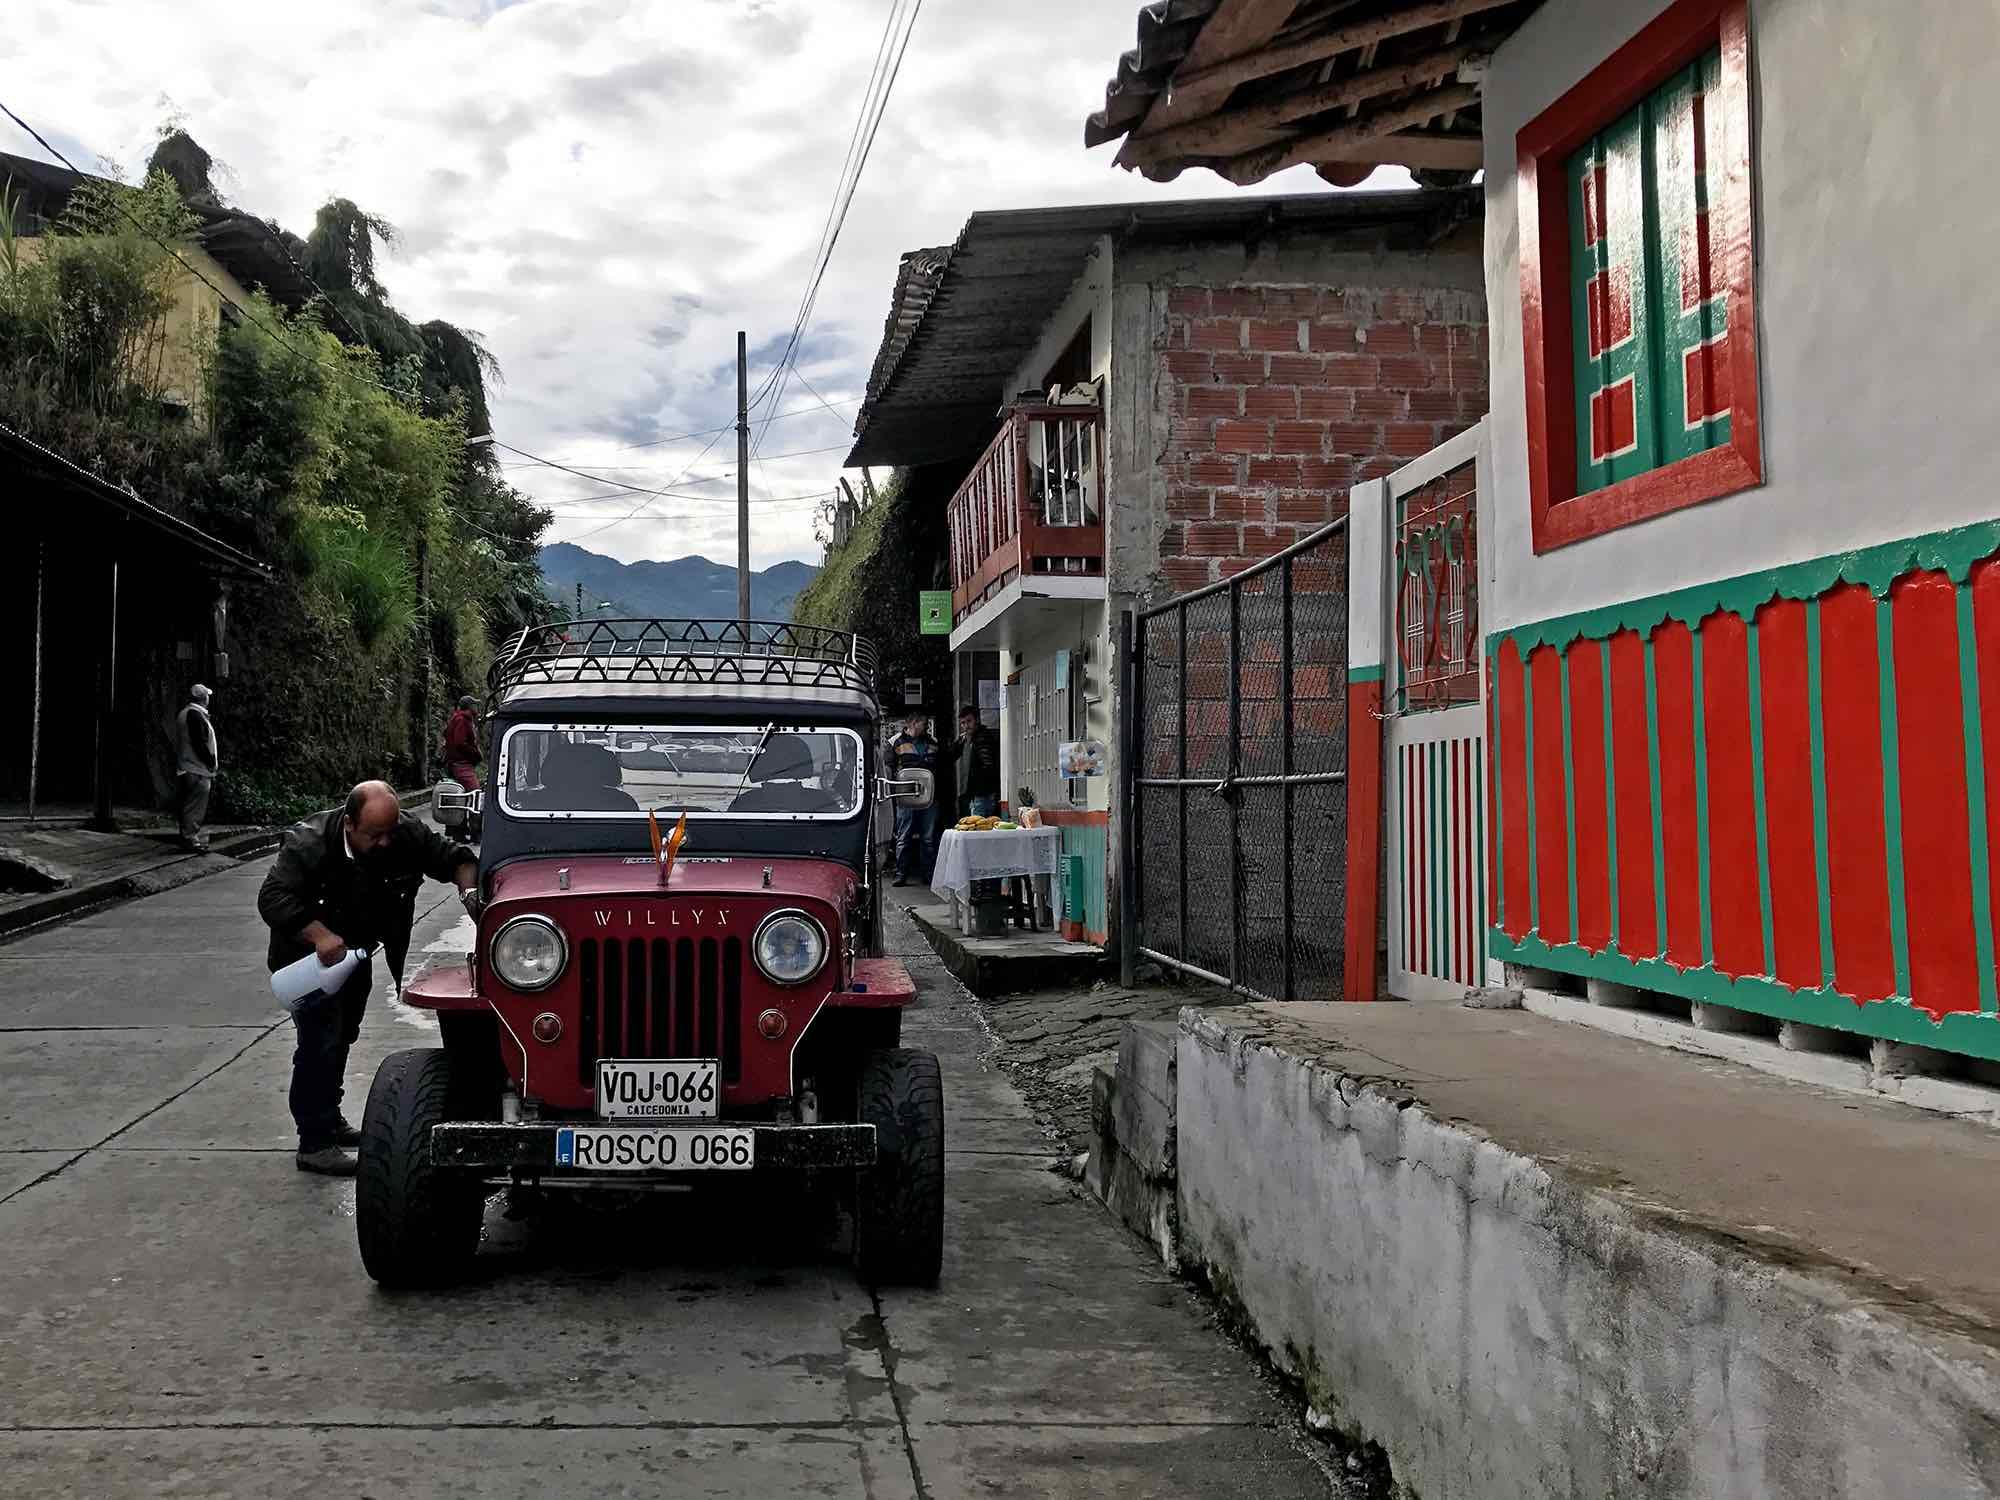 Jeep in Salento | Cocora Valley, Colombia